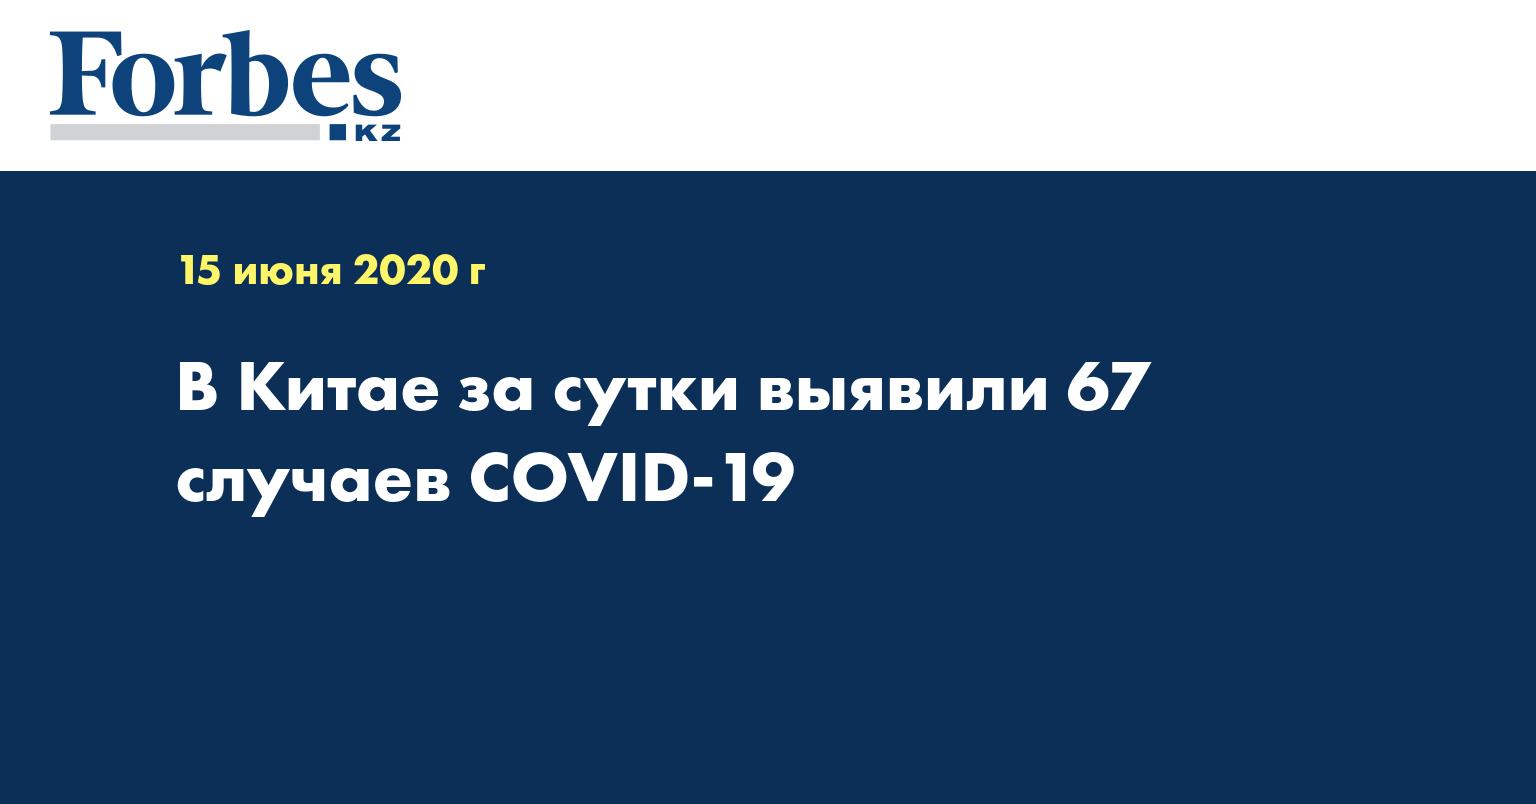 В Китае за сутки выявили 67 случаев COVID-19